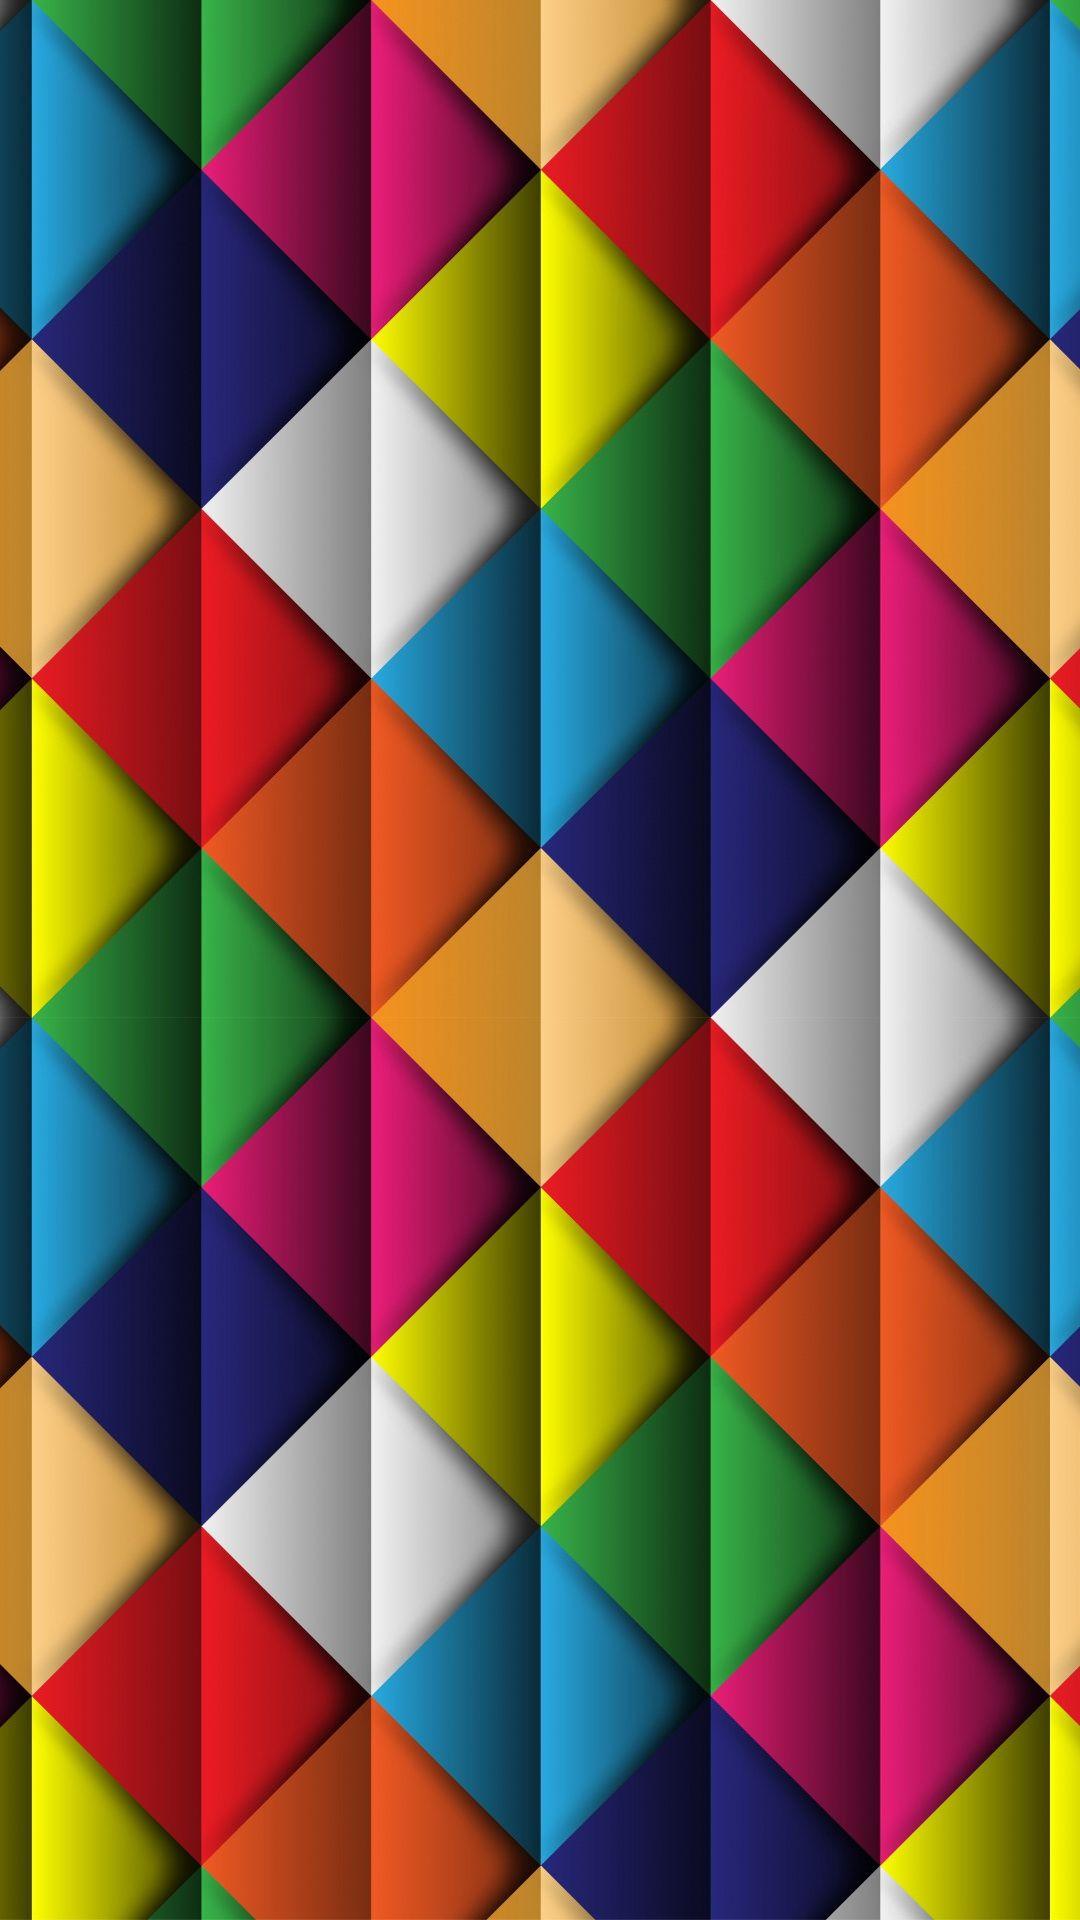 Muchatseble Beautiful Wallpapers Backgrounds Rainbow Wallpaper Samsung Galaxy Wallpaper